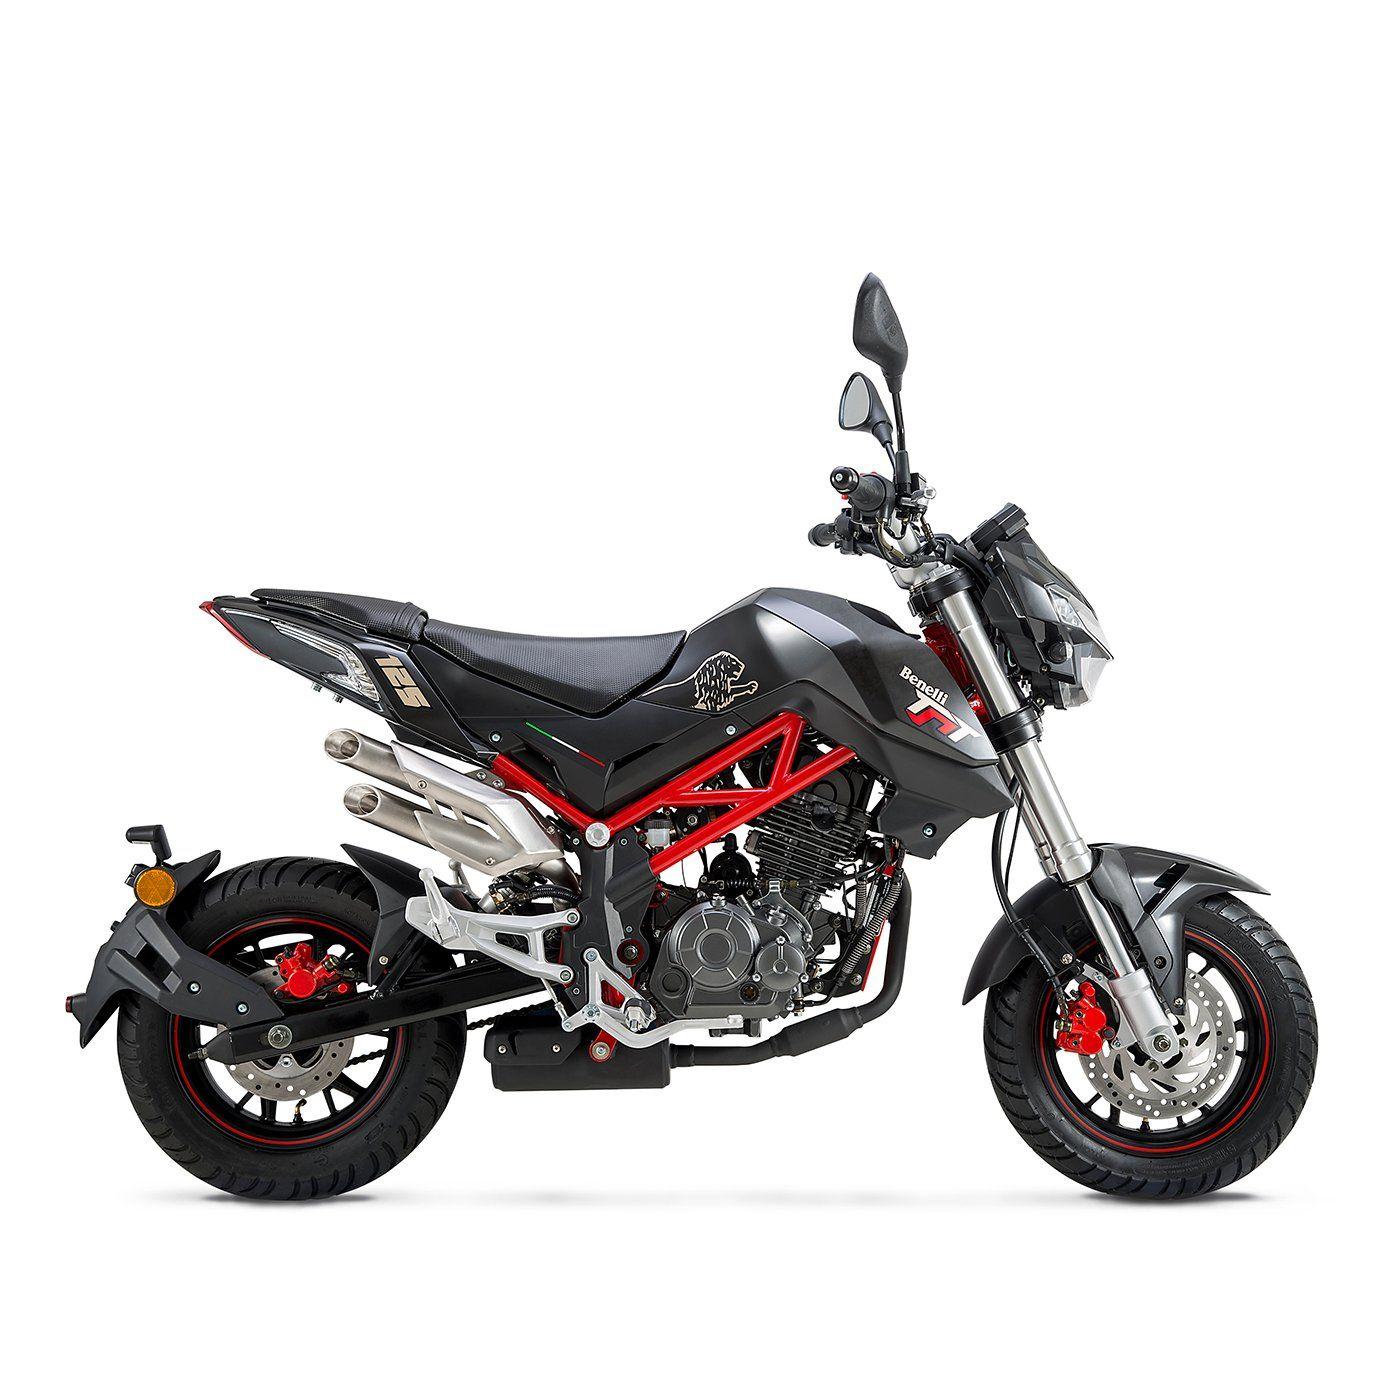 Naked. Tornado Naked T 125: Tienda de motos  de Motos Llera